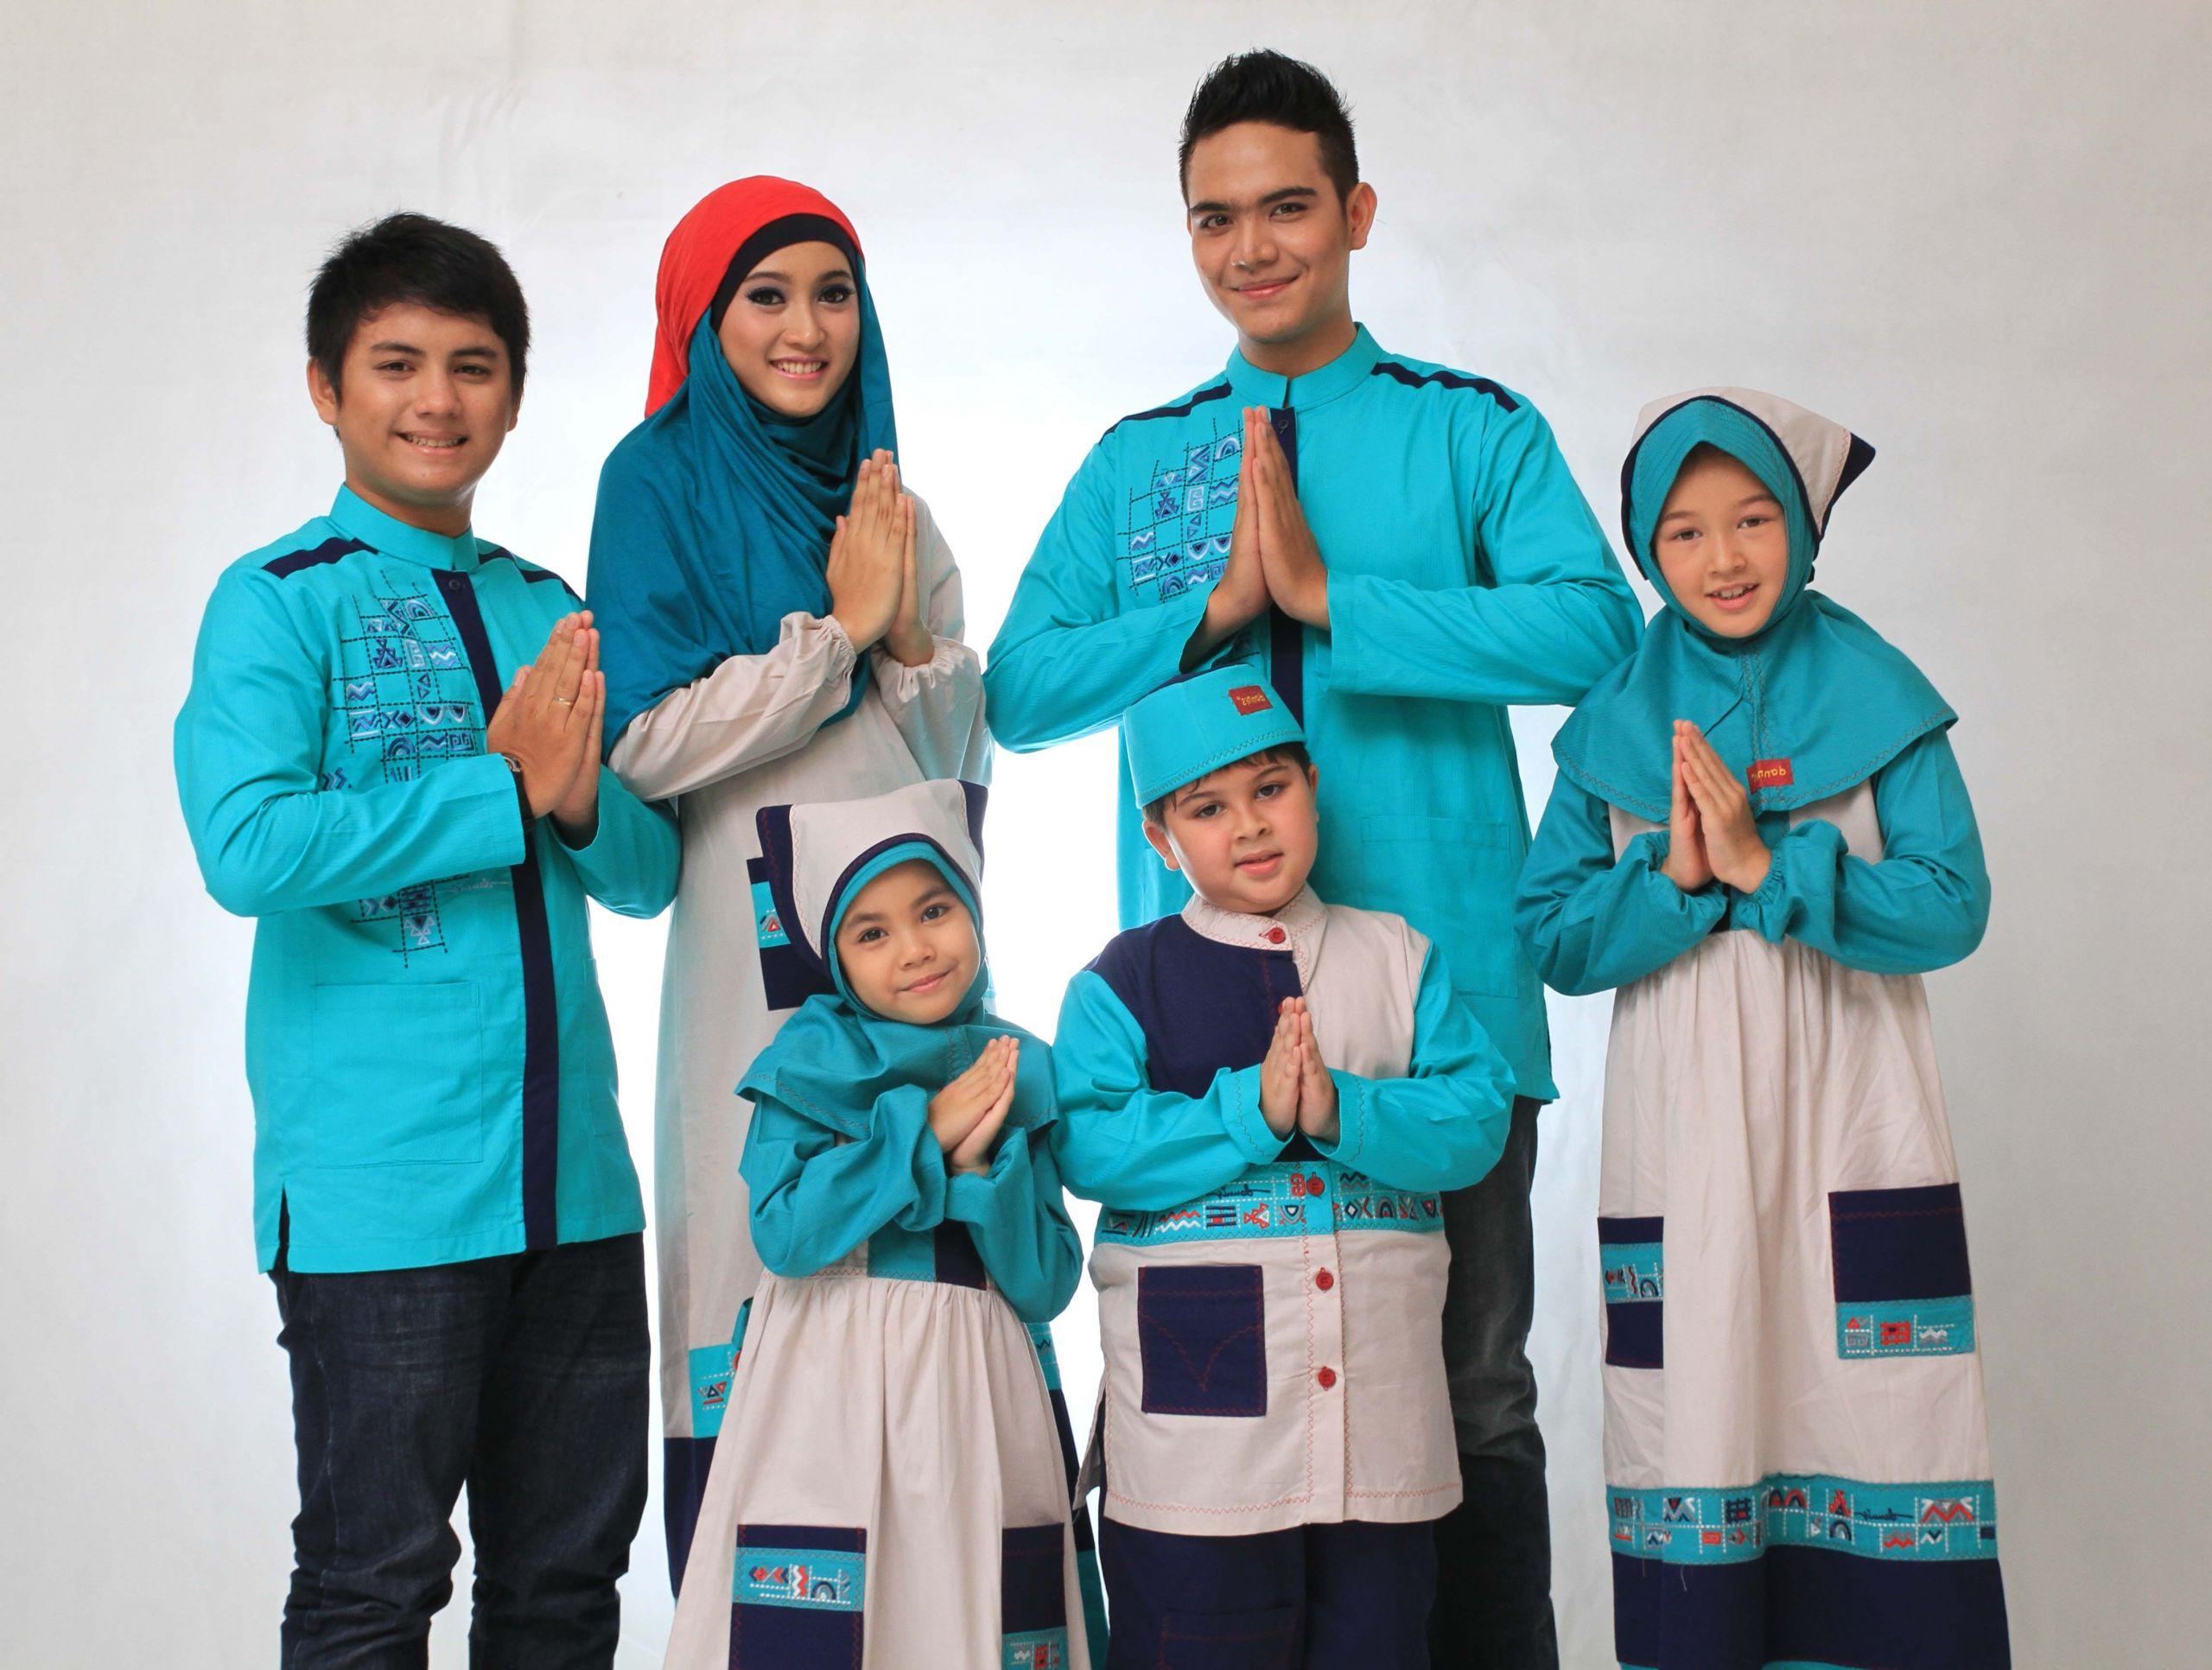 Bentuk Baju Lebaran Keluarga Terbaru Ftd8 Baju Muslim Untuk Lebaran Berhijab